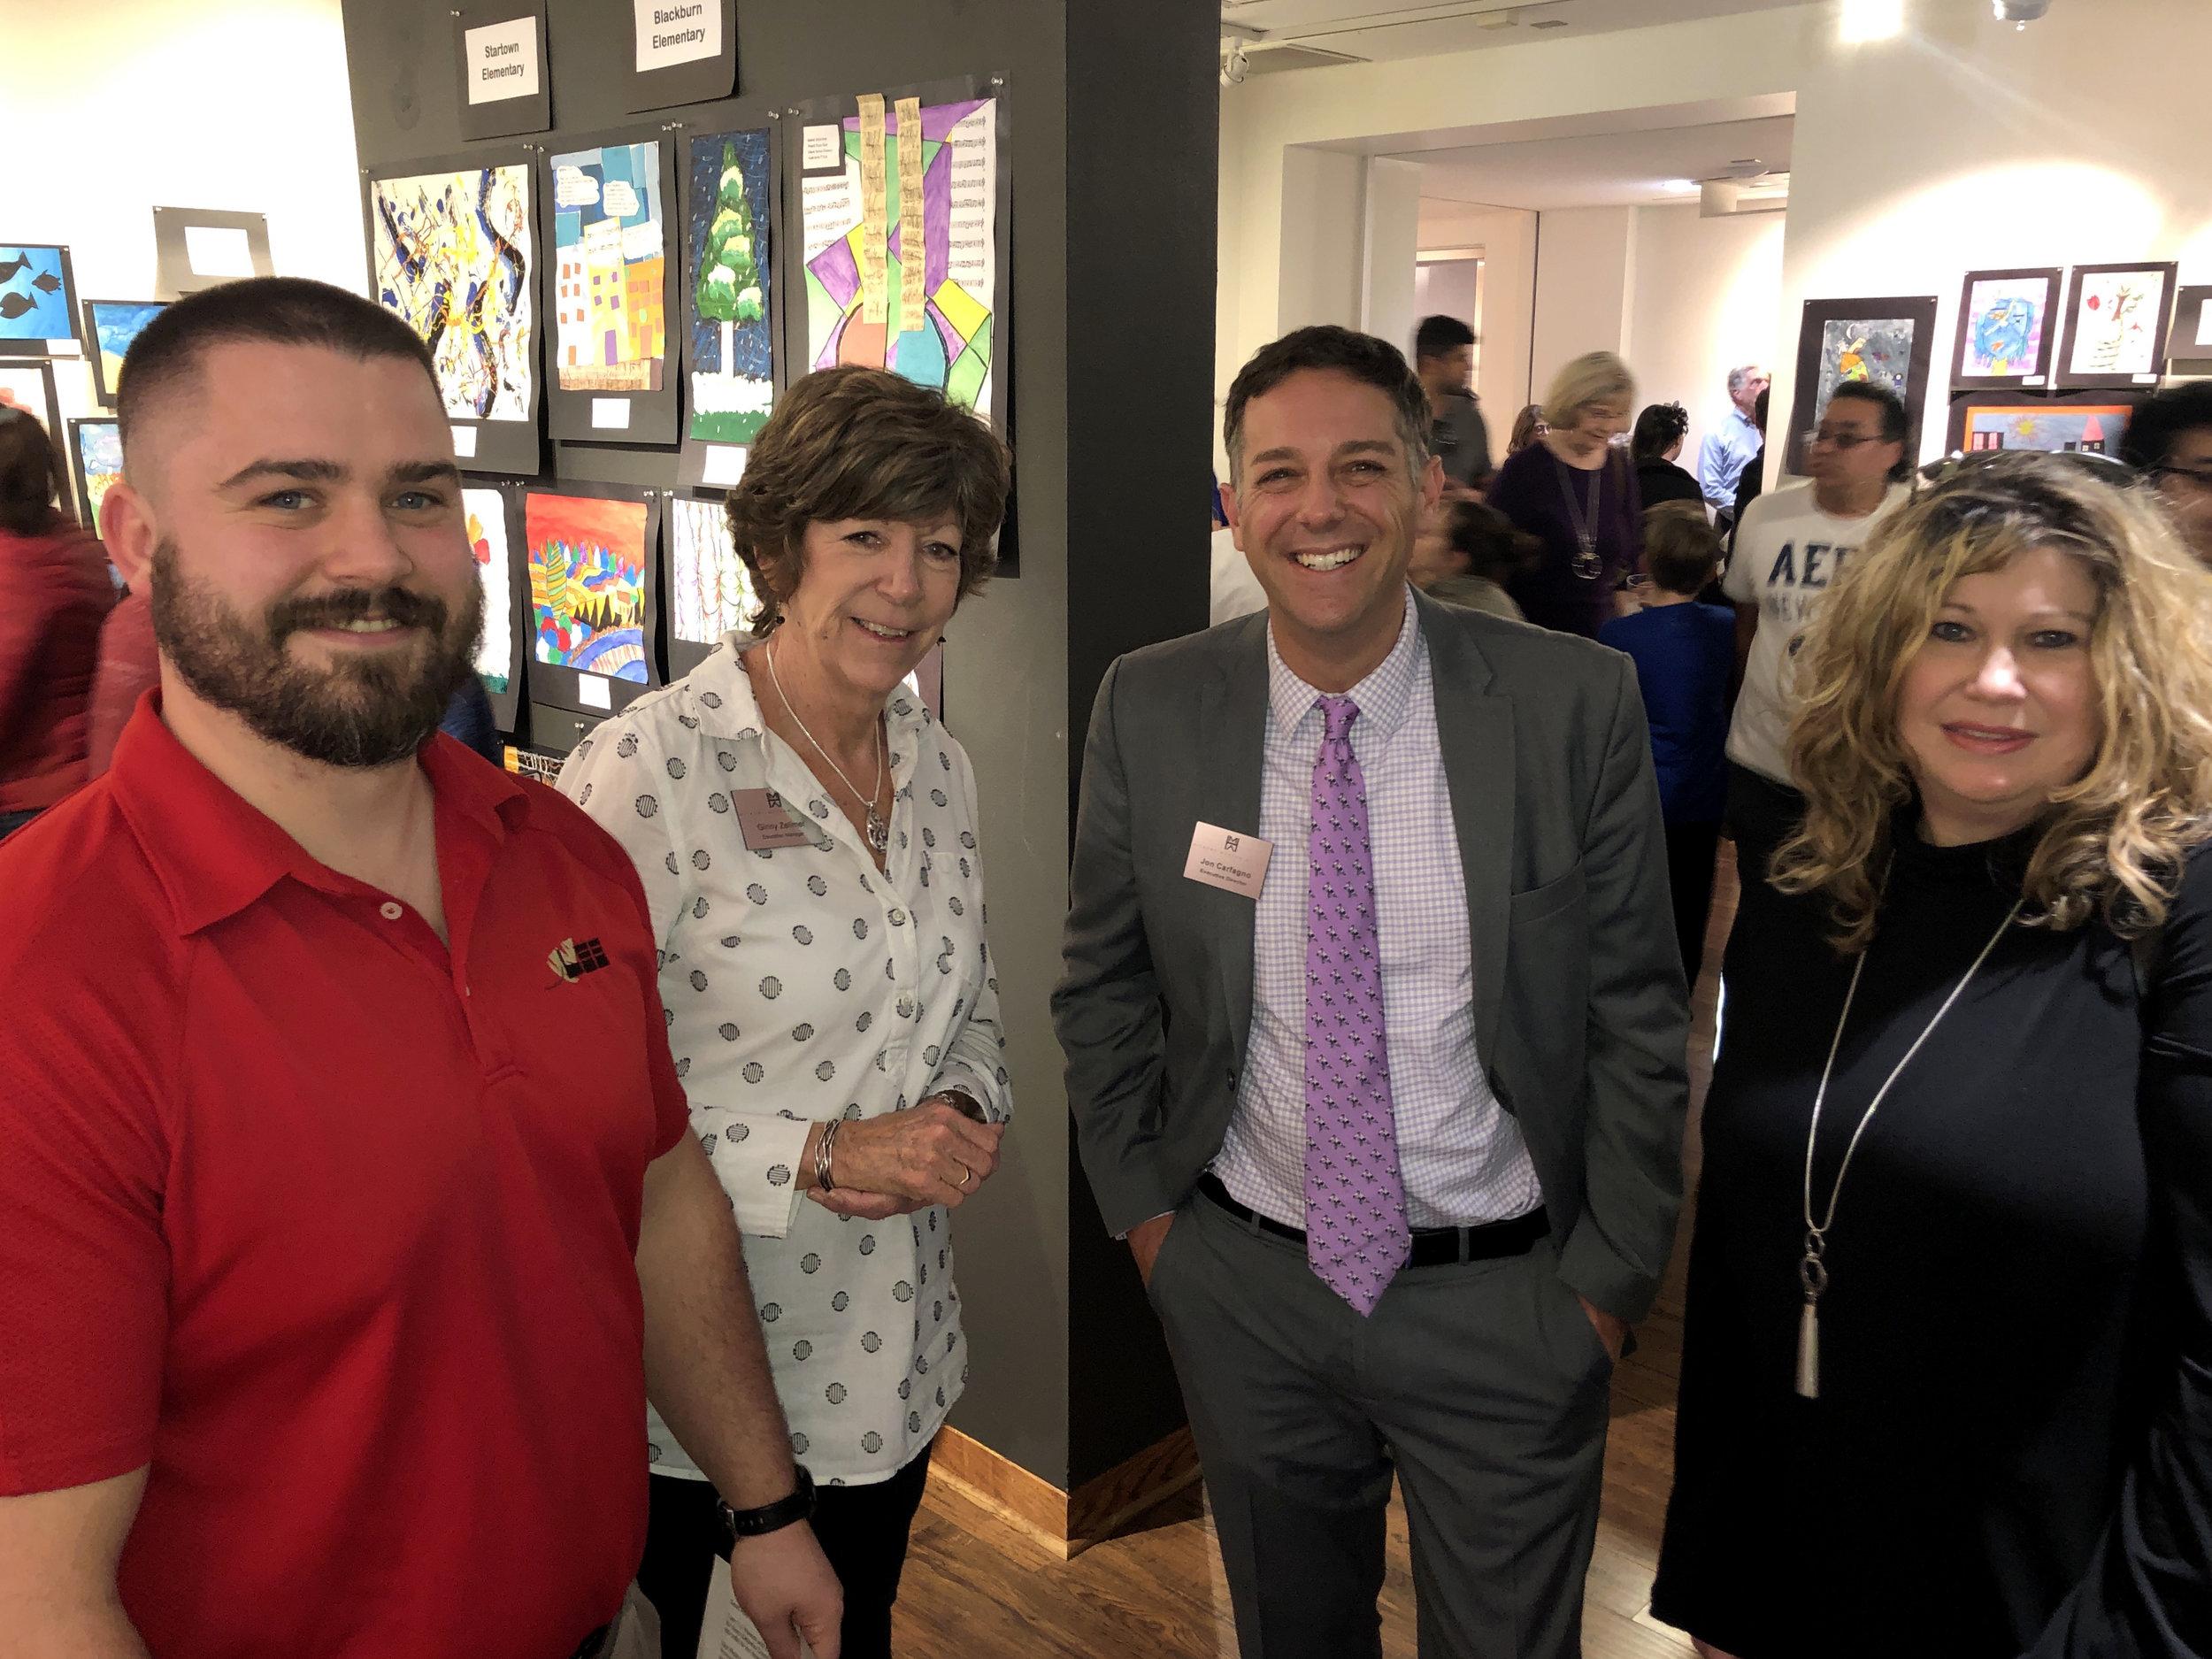 72nd Annual Paul Whitener Student Art Show